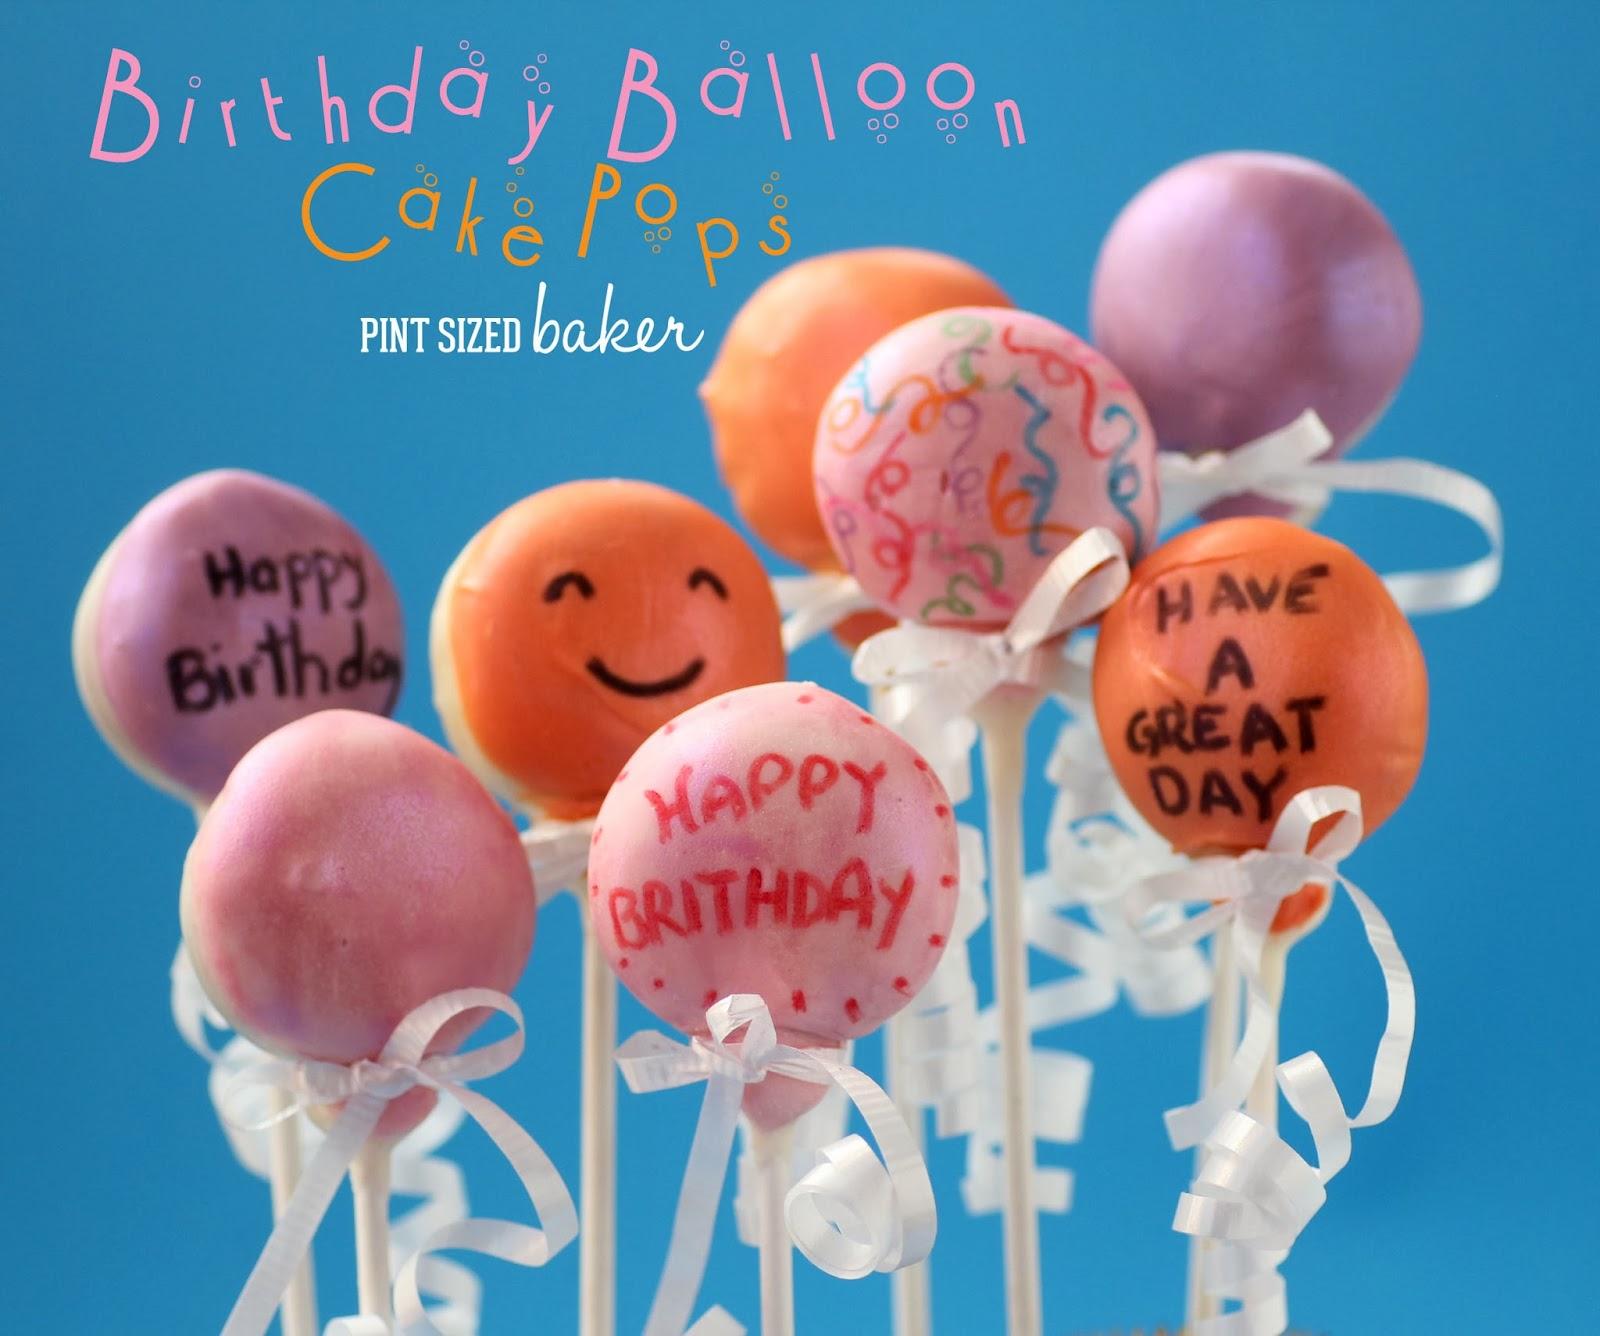 Happy Birthday Balloon Cake Pops Pint Sized Baker